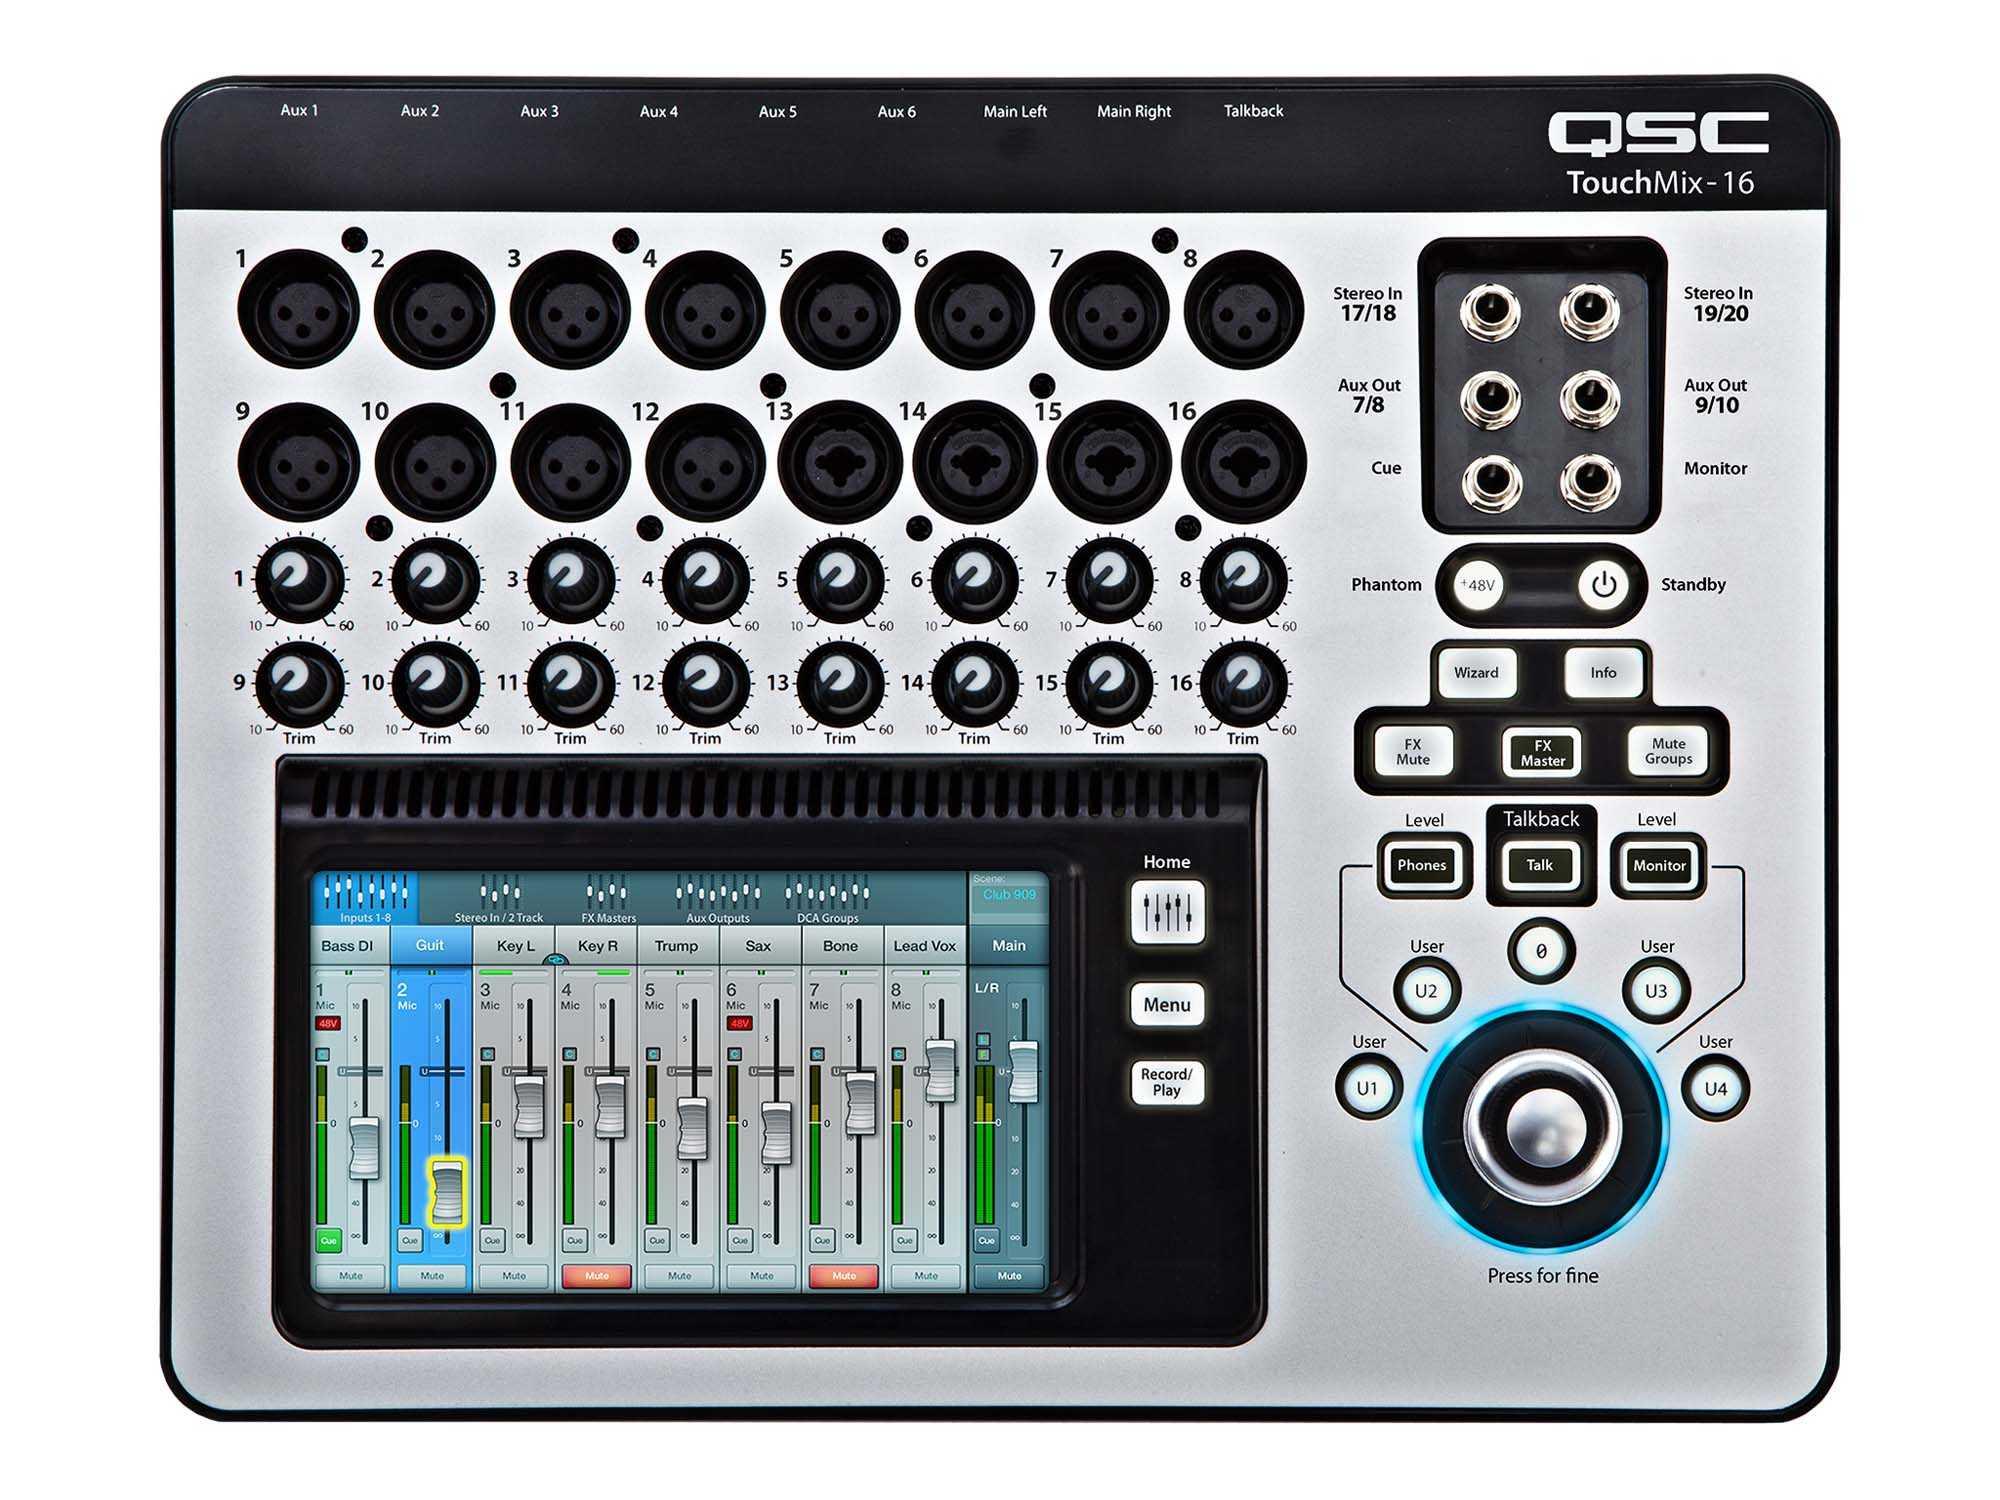 qsc-touchmix-16.jpg